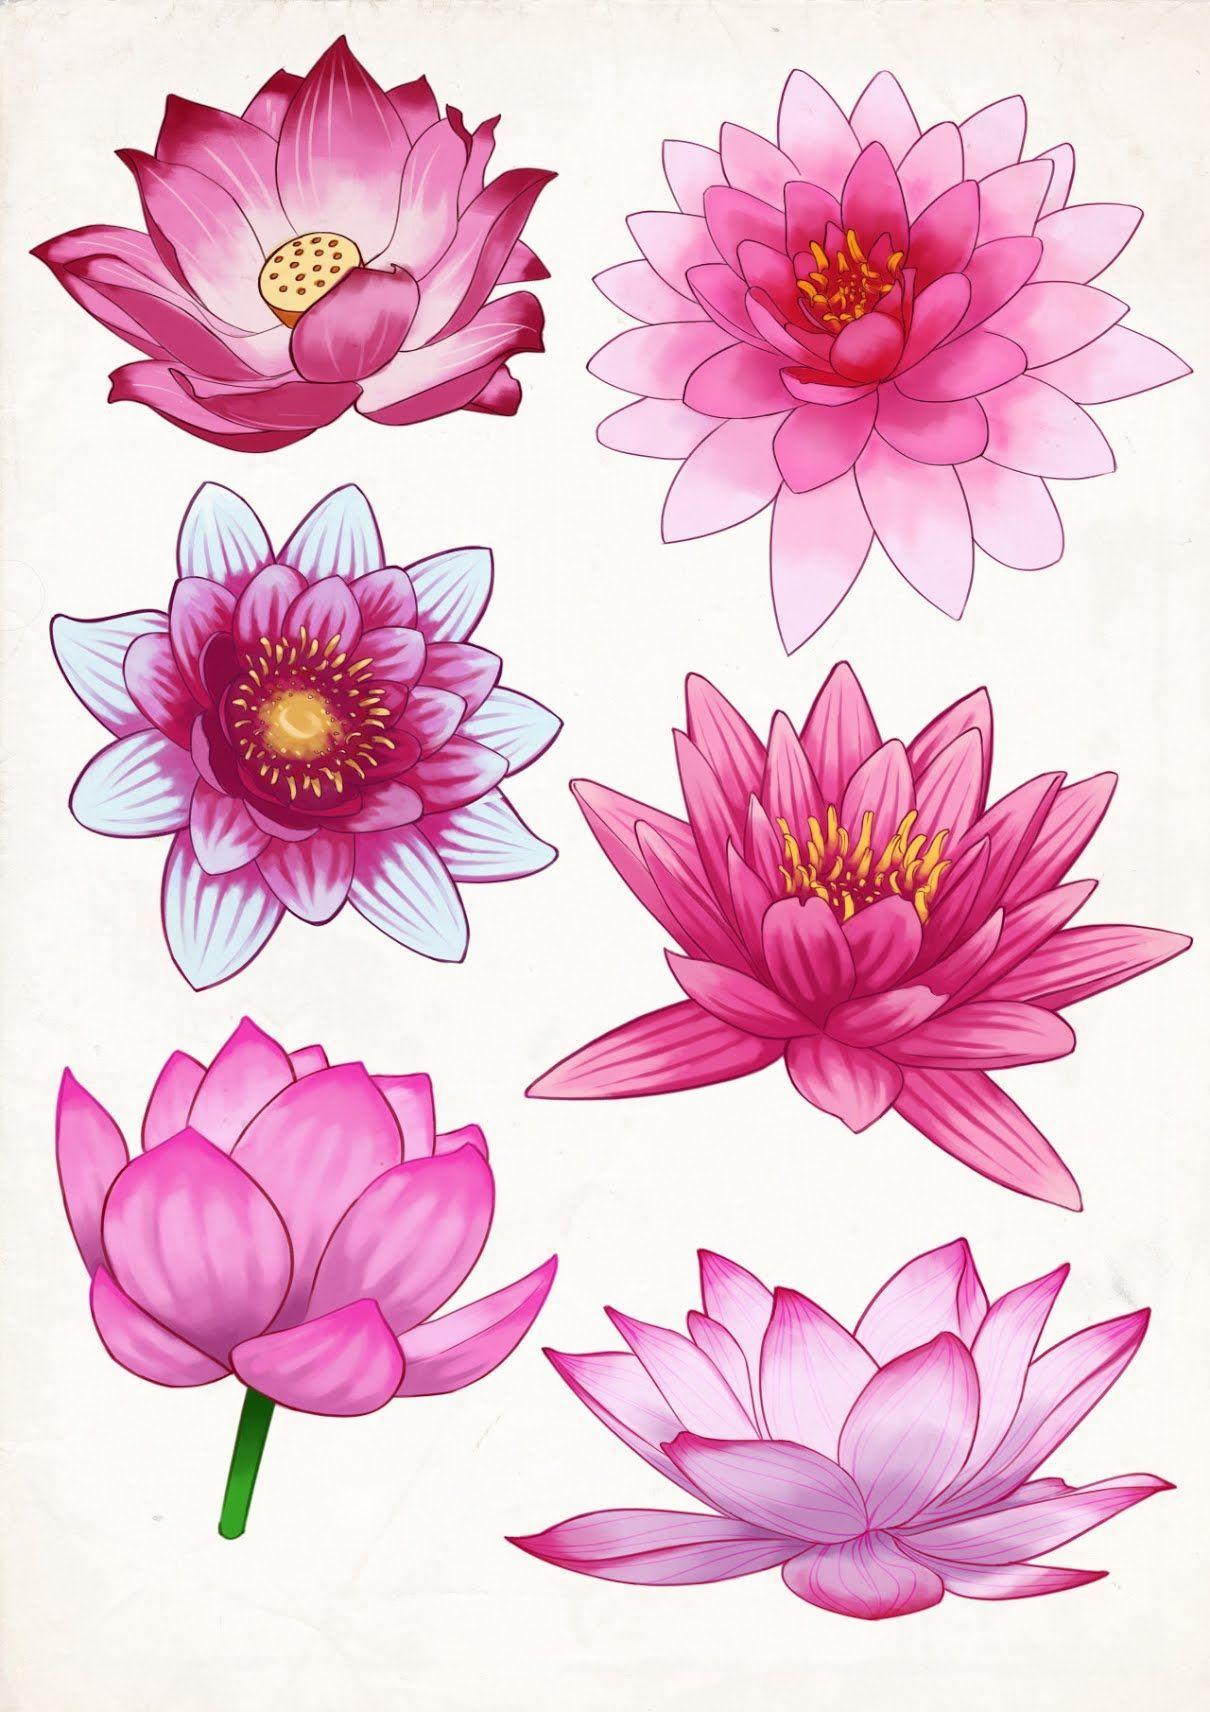 Felinetrickster Artwork Some Pink Lotus Flower Studies